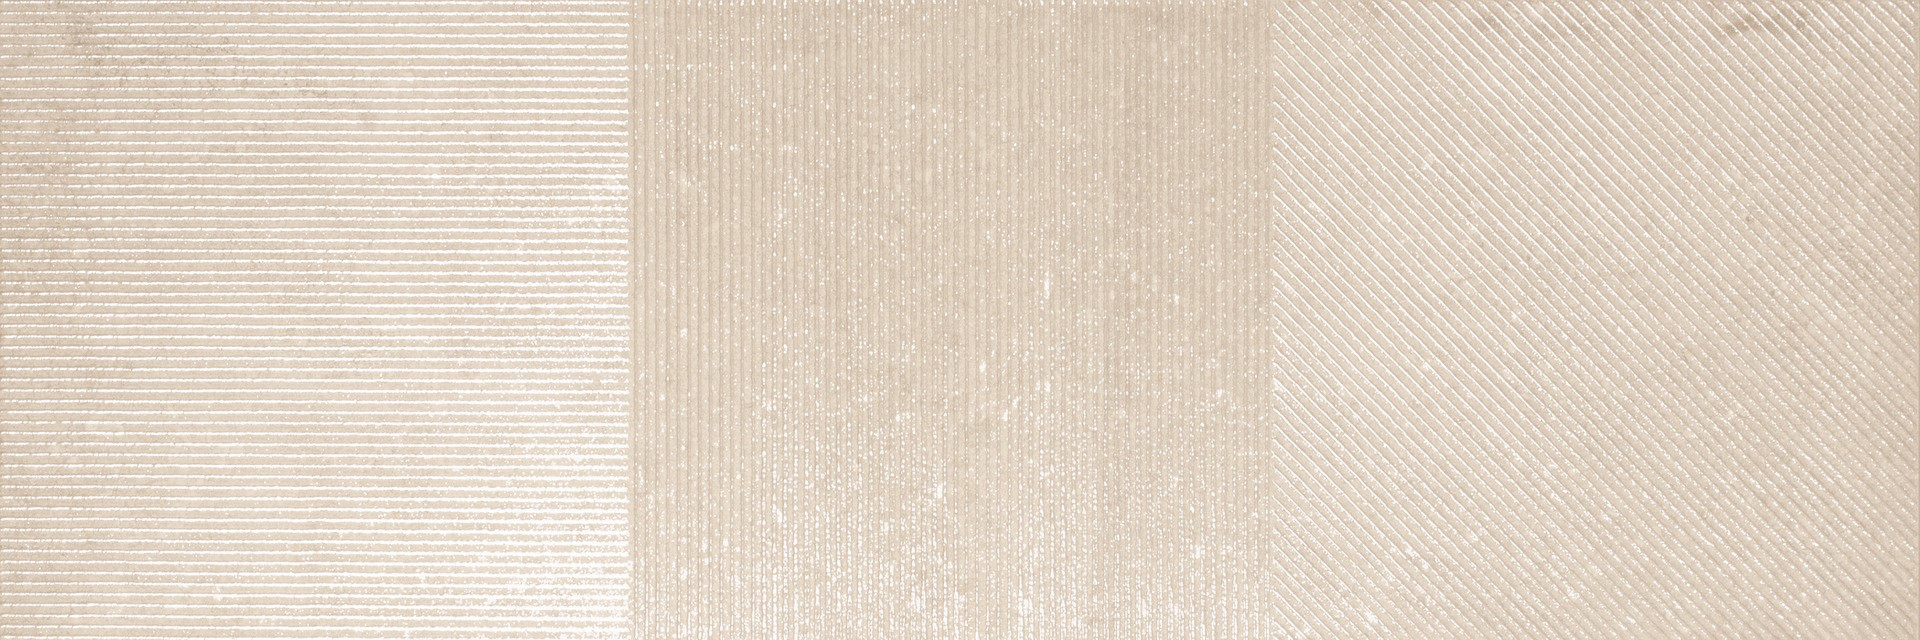 Obklad Eclat Sand 30x90 cm, mat